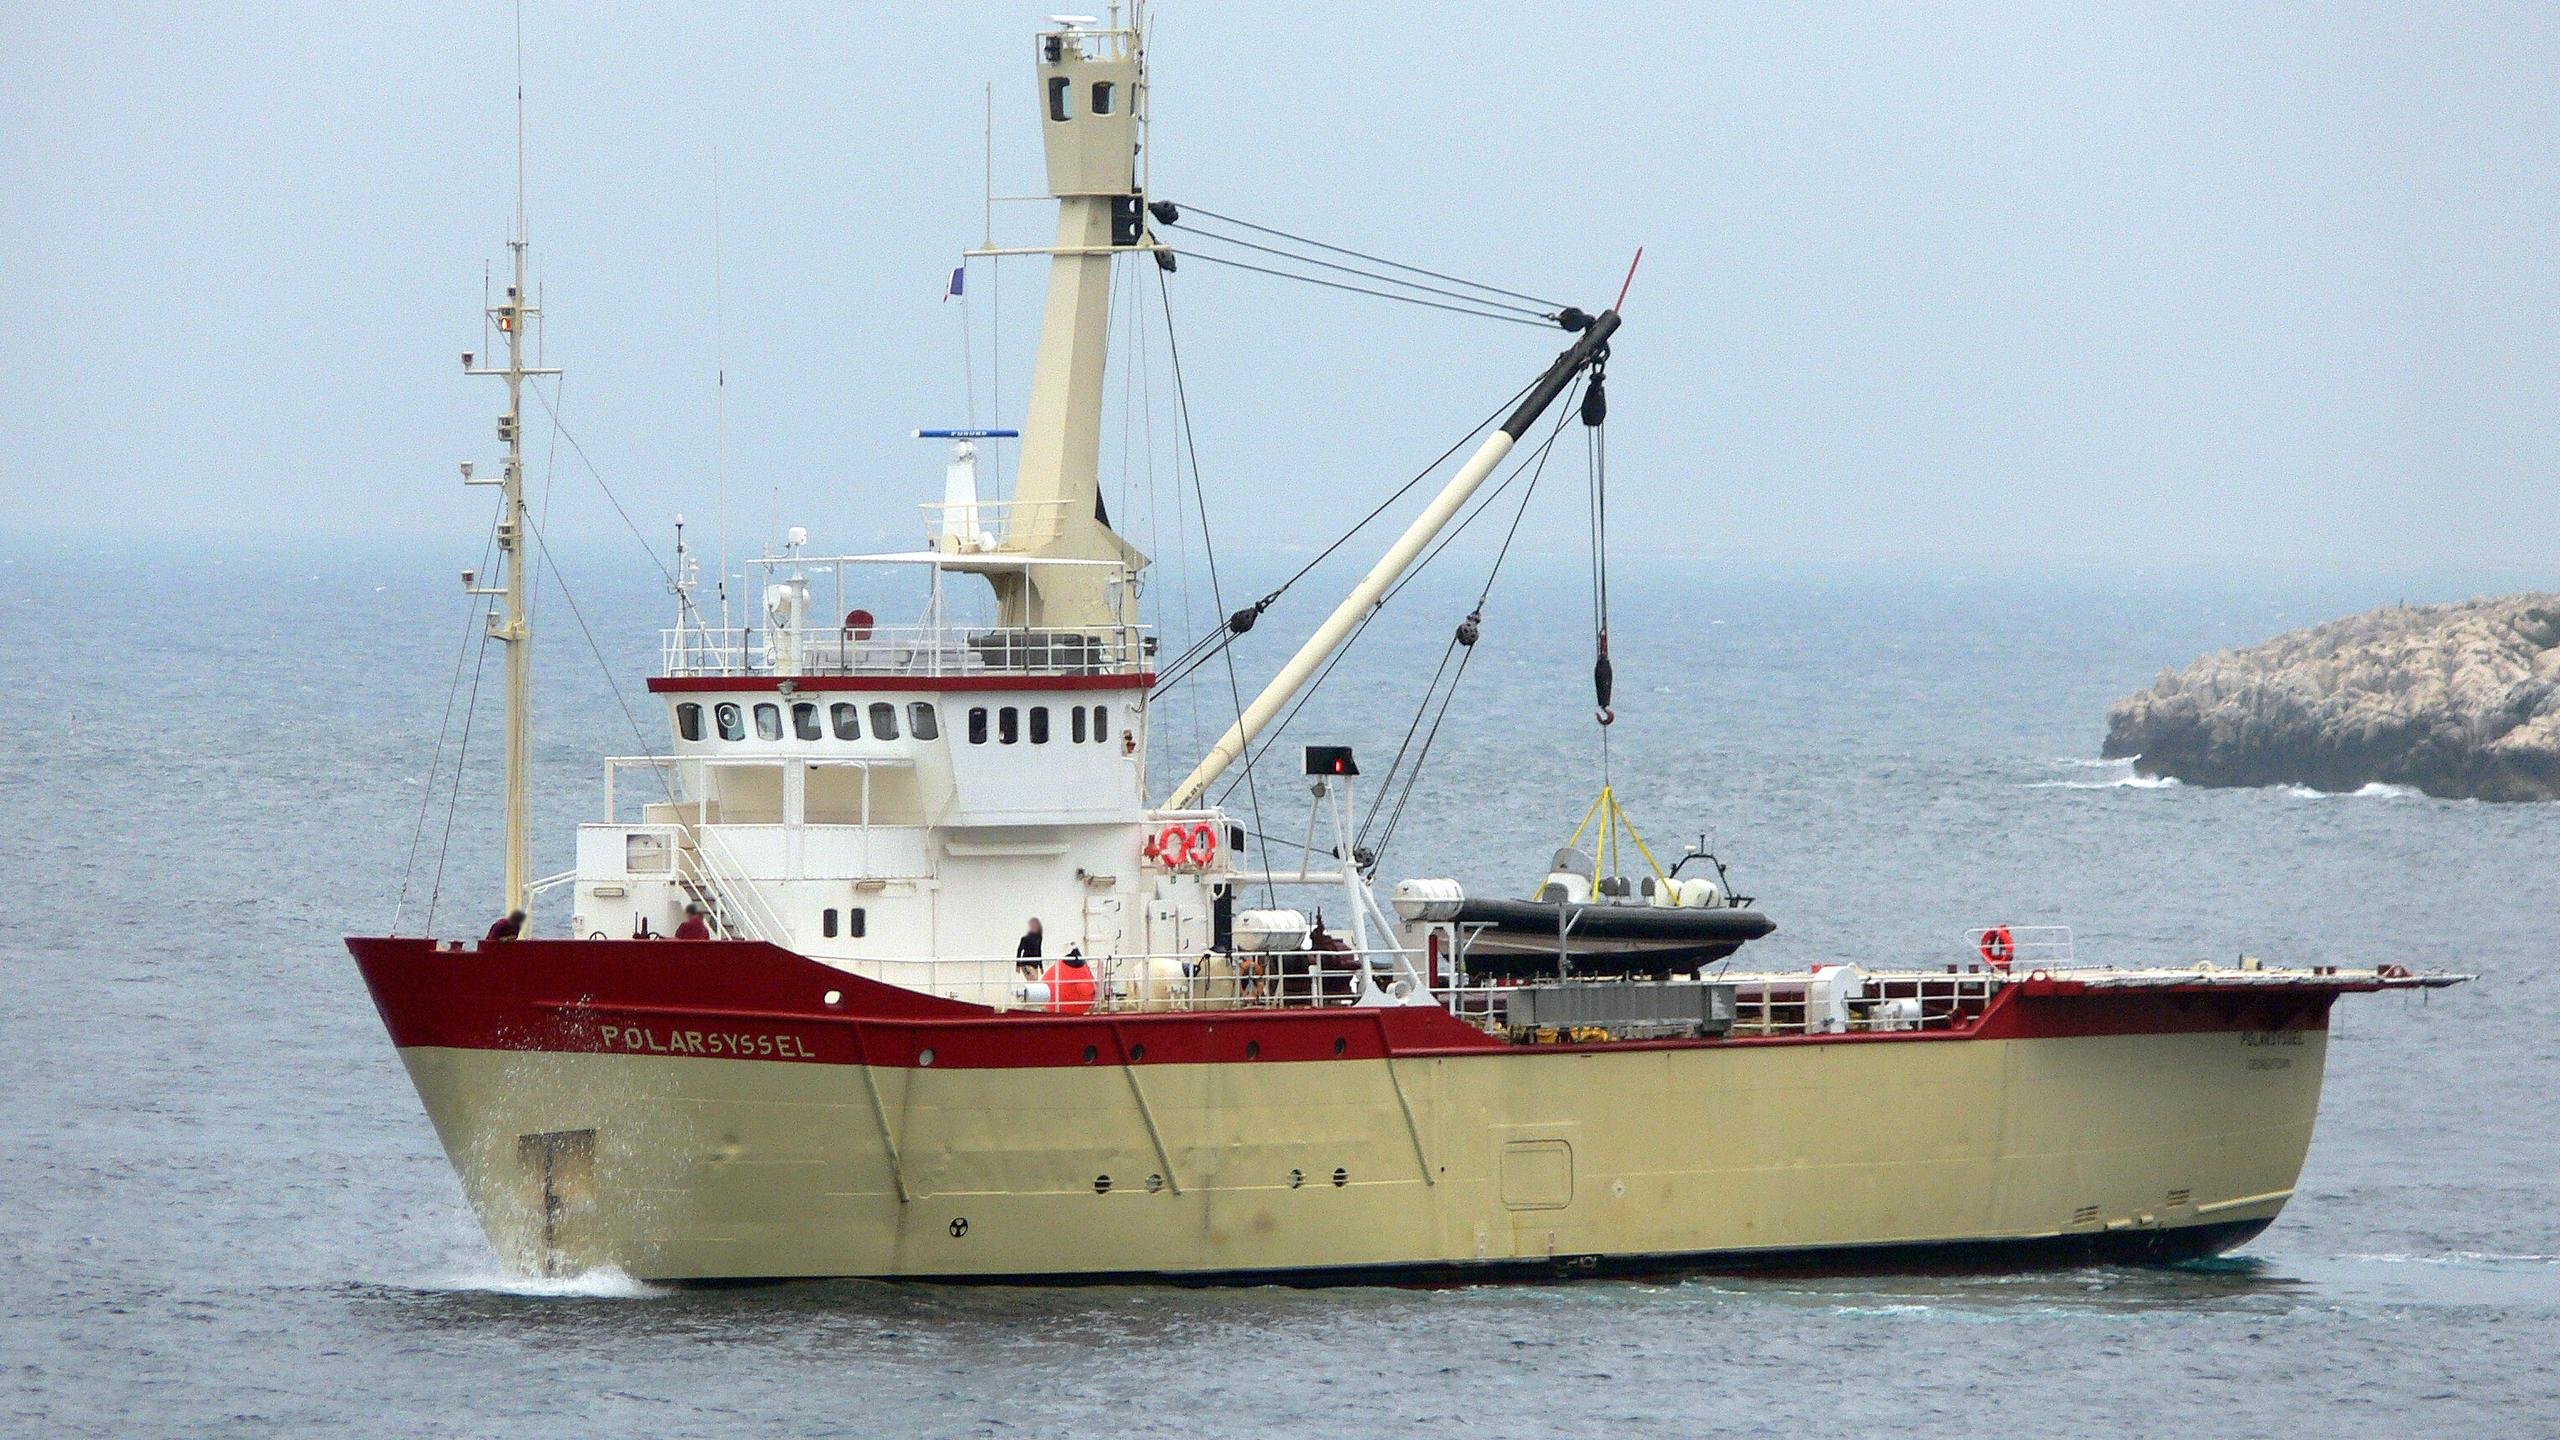 polarsyssel-expedition-yacht-hoivolds-1976-50m-half-profile-anchor